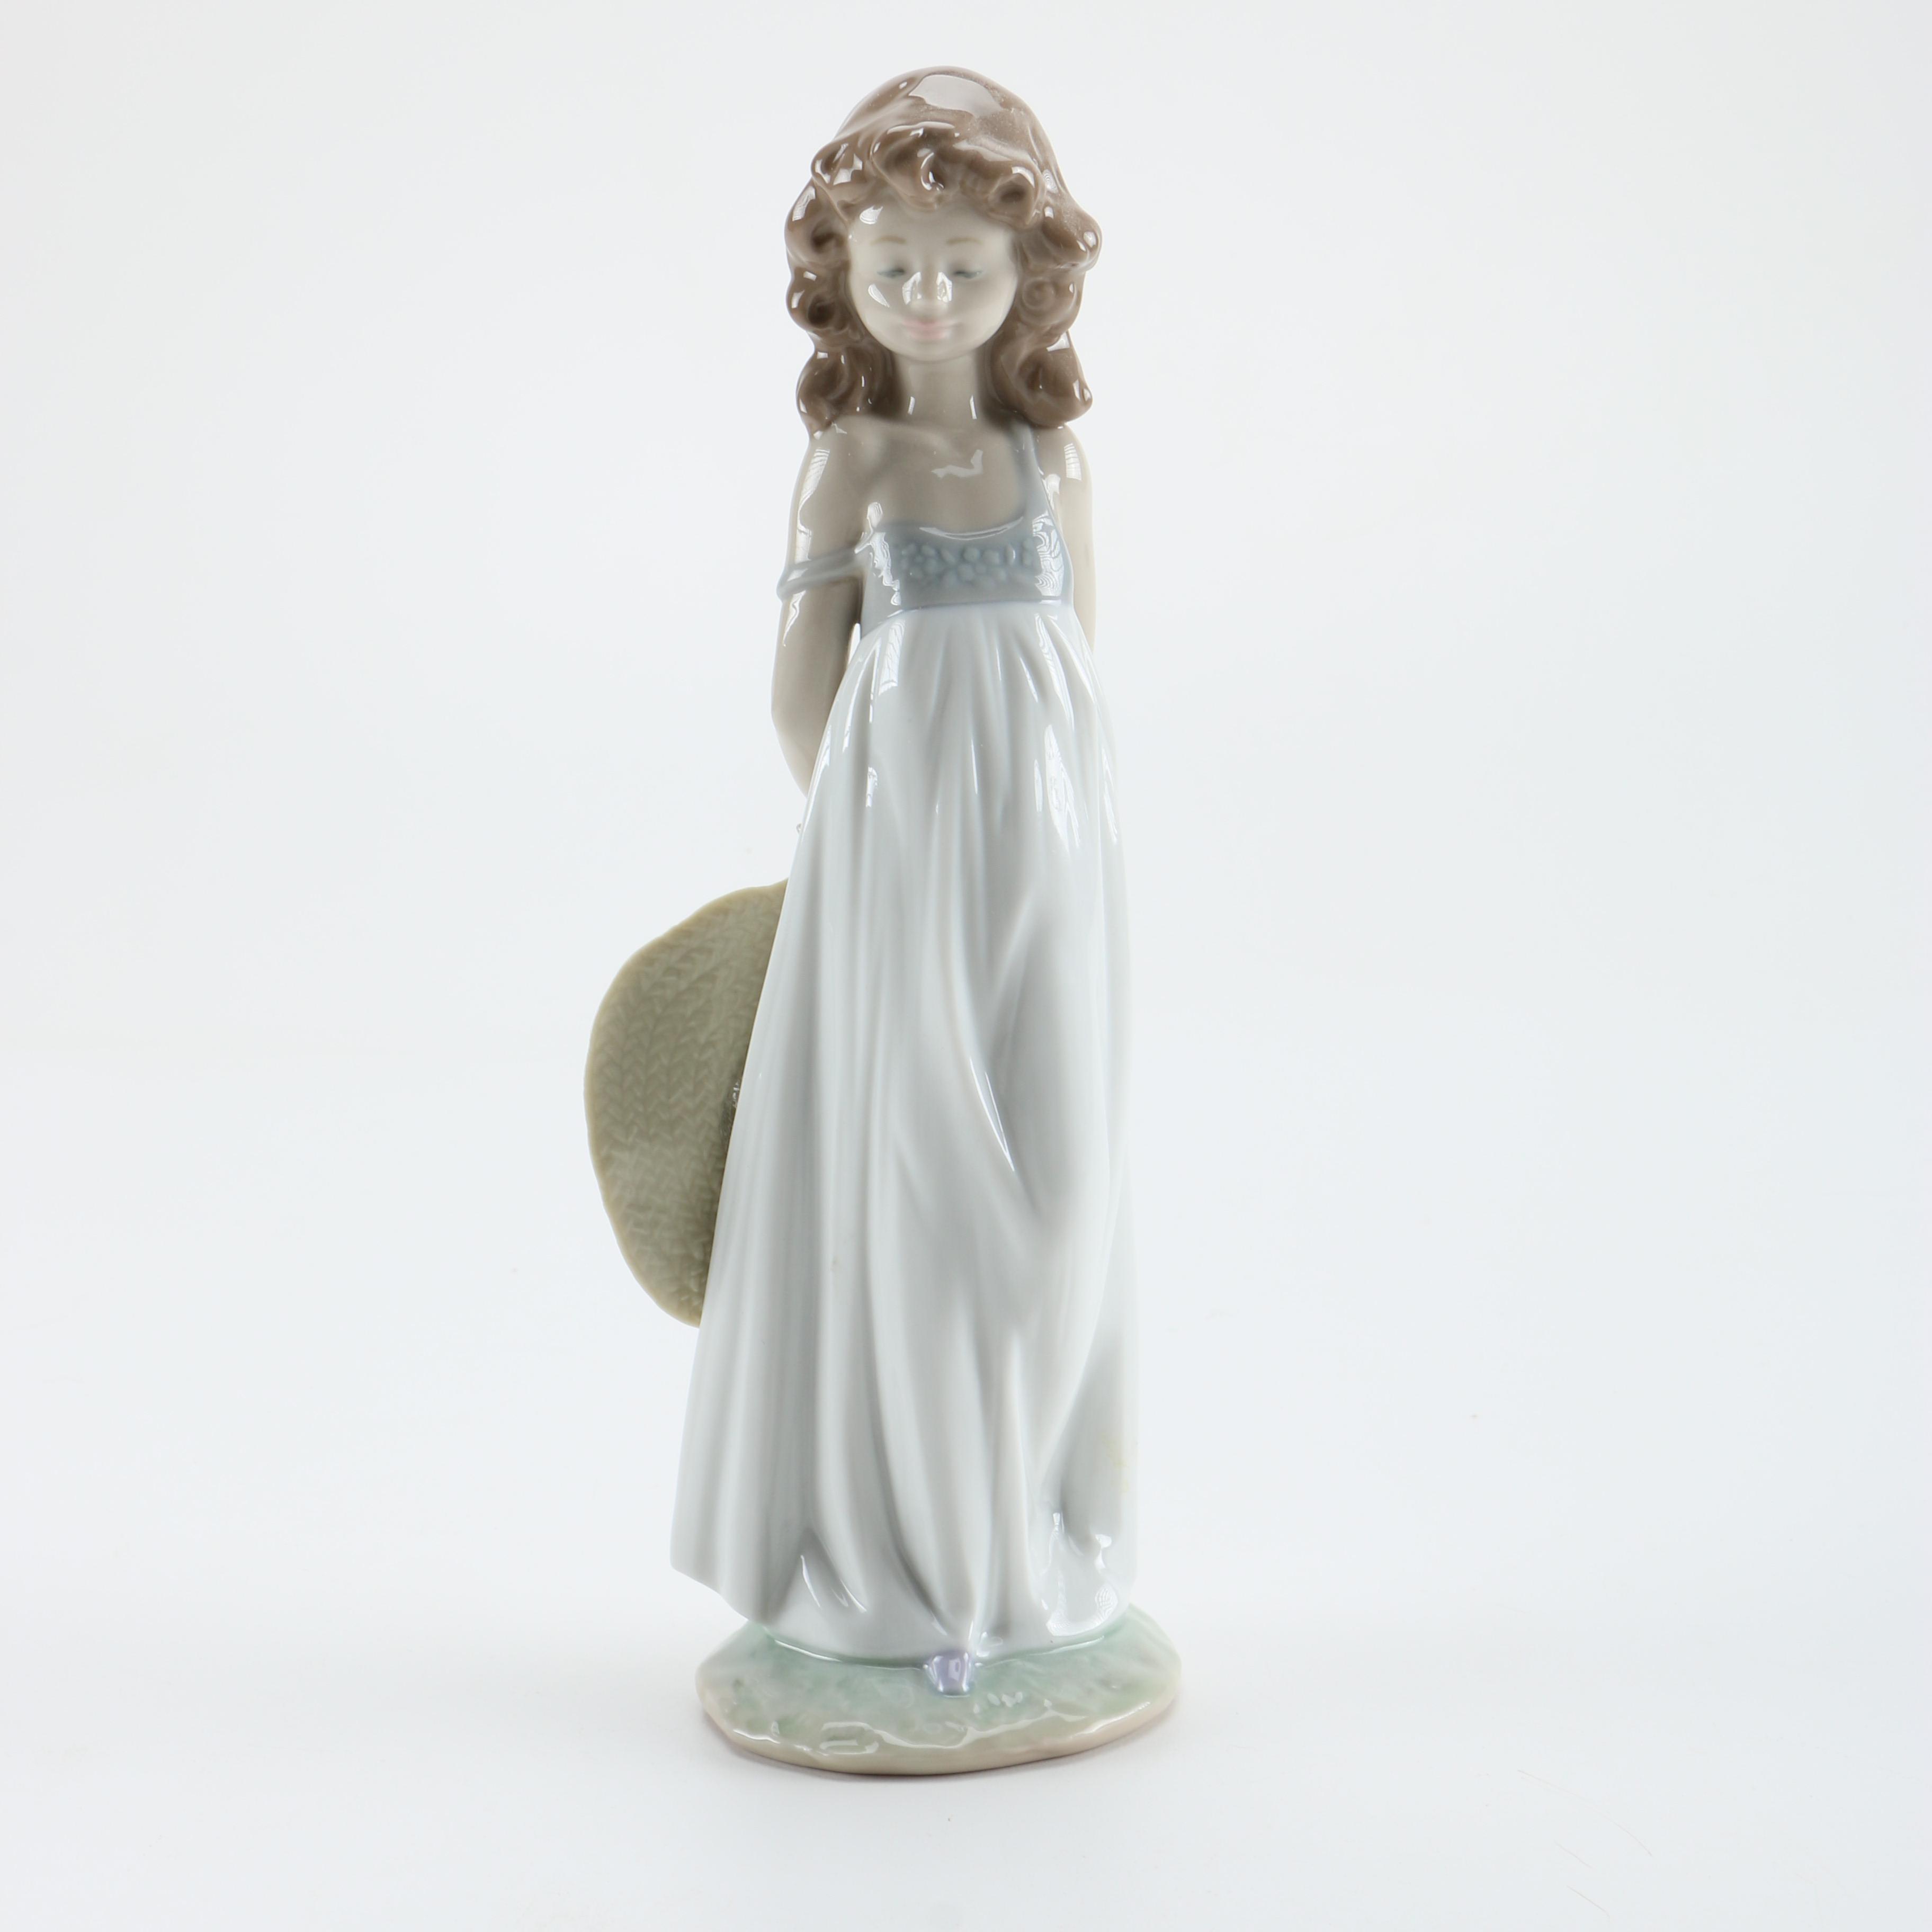 Spanish Lladró Porcelain 2005 Events Creation Figurine